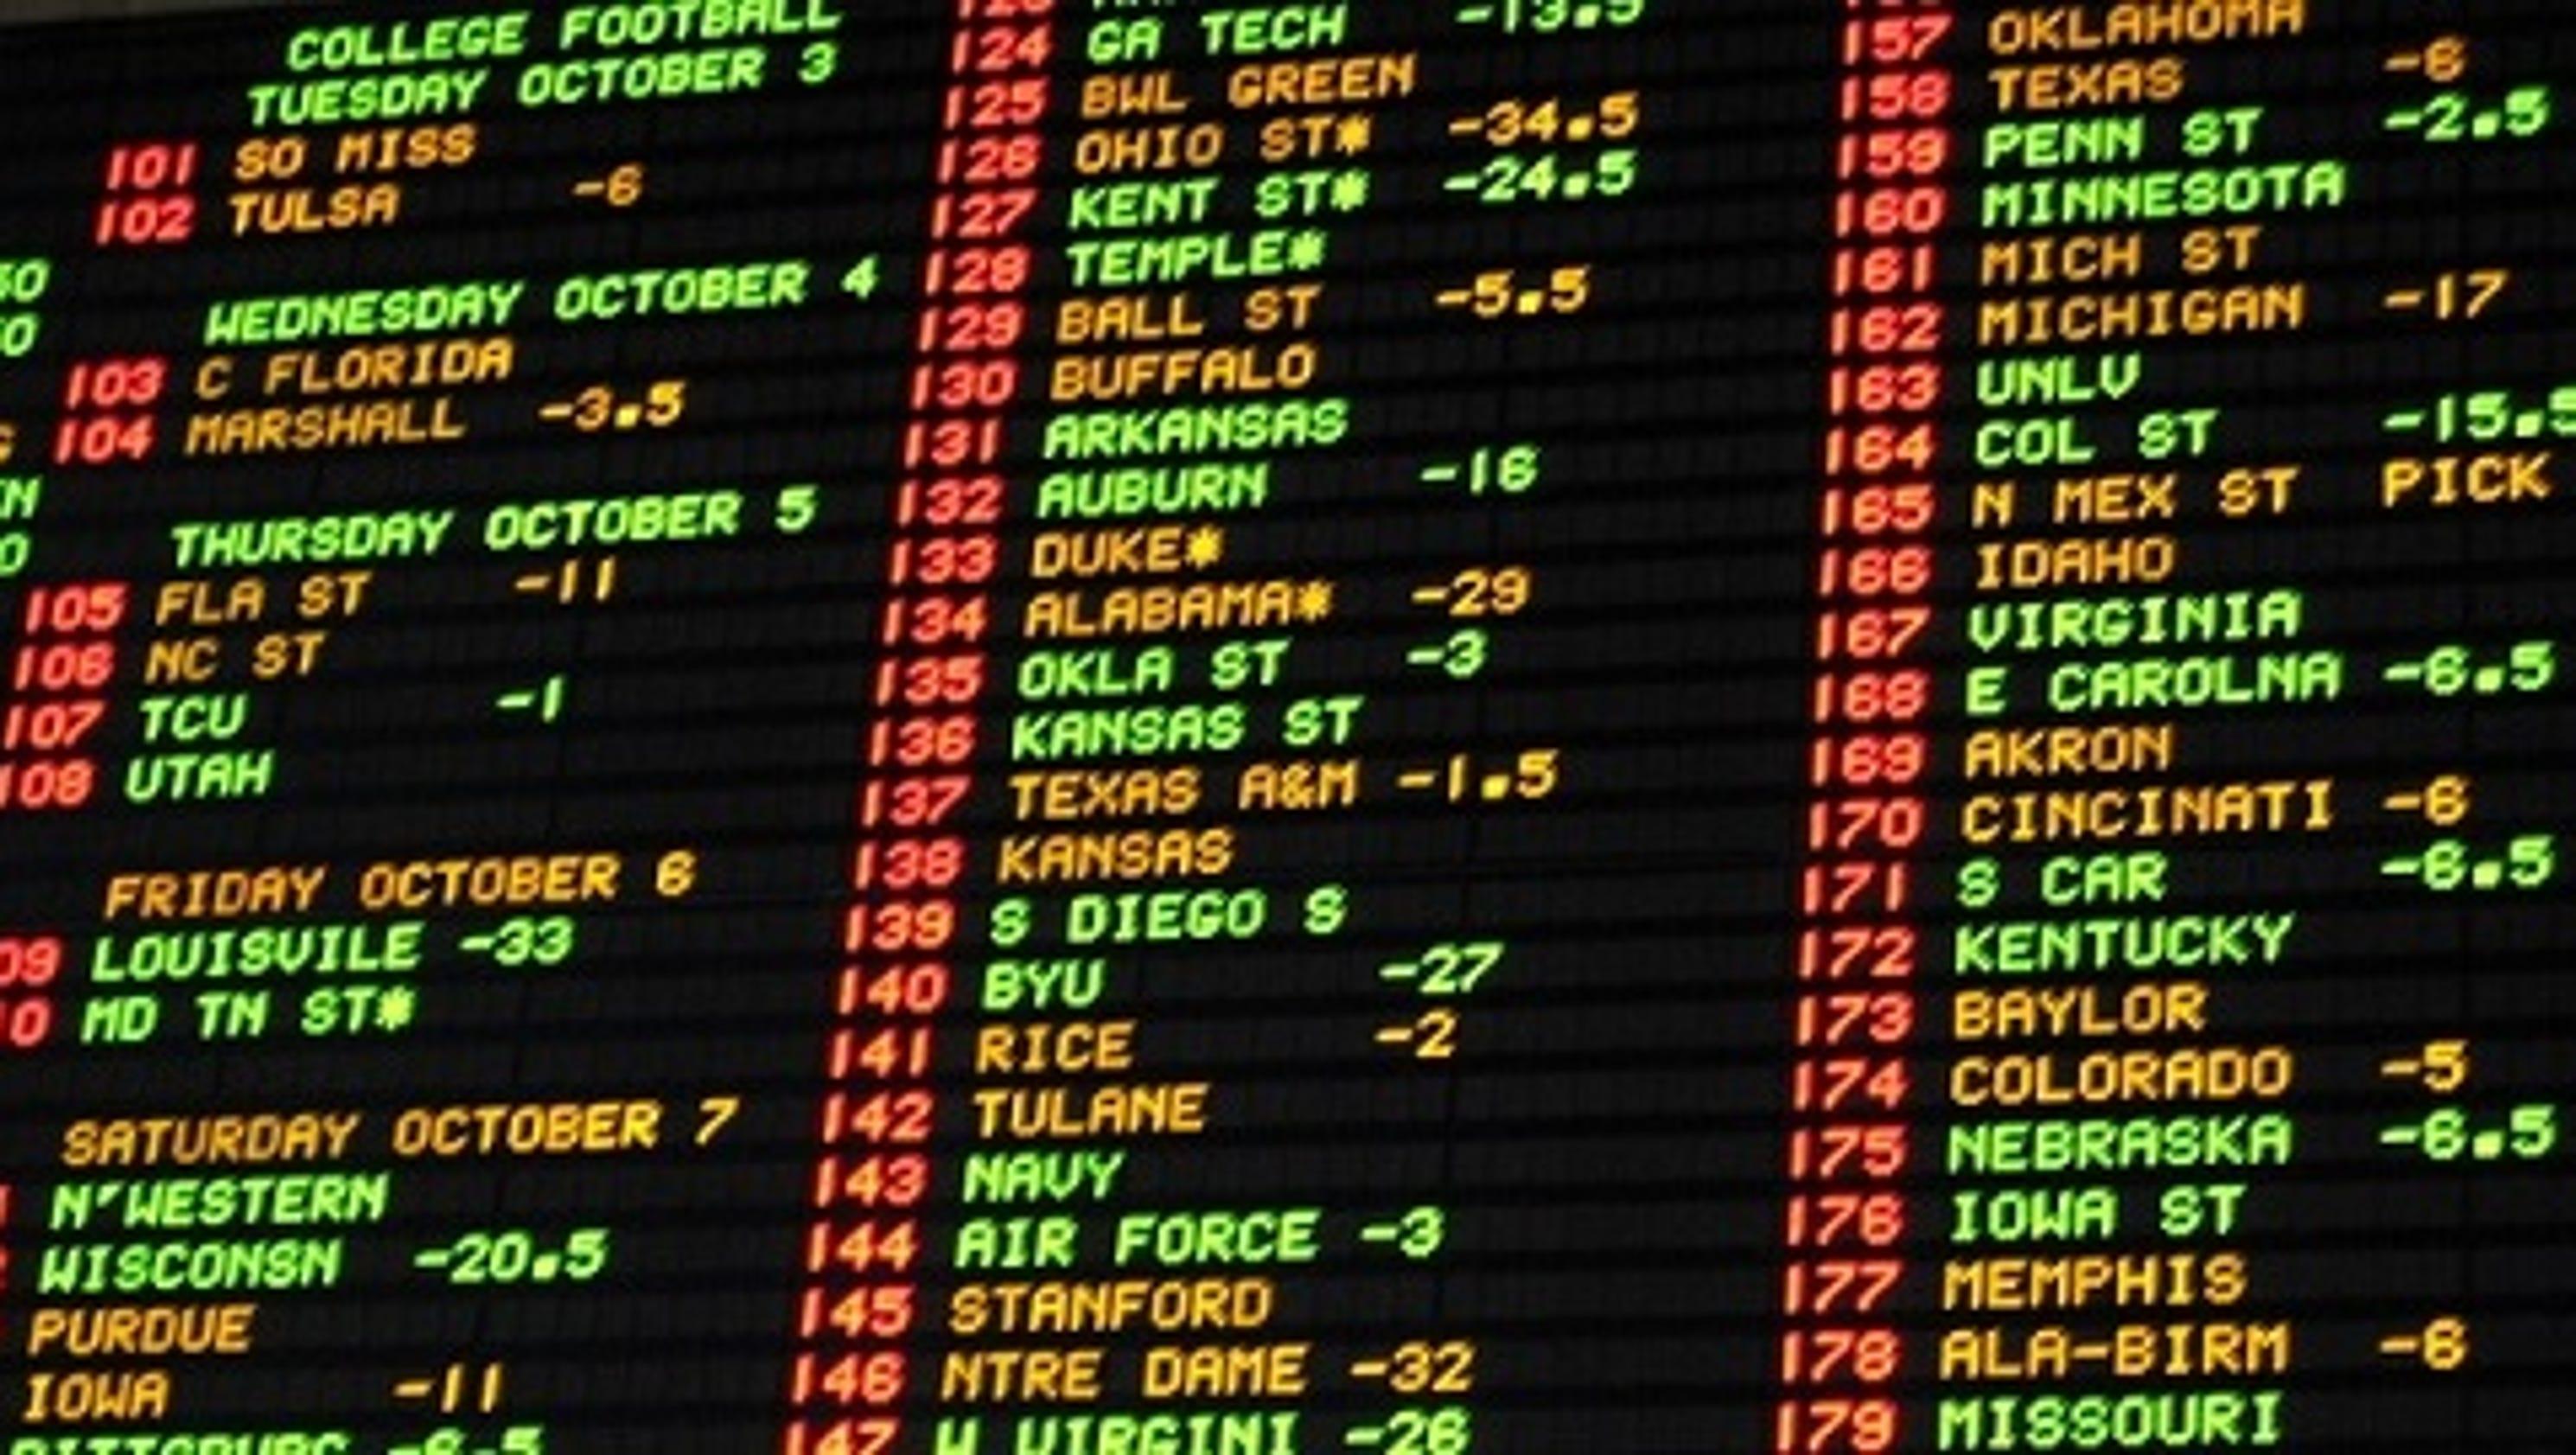 635829464731686204-college-football-betting